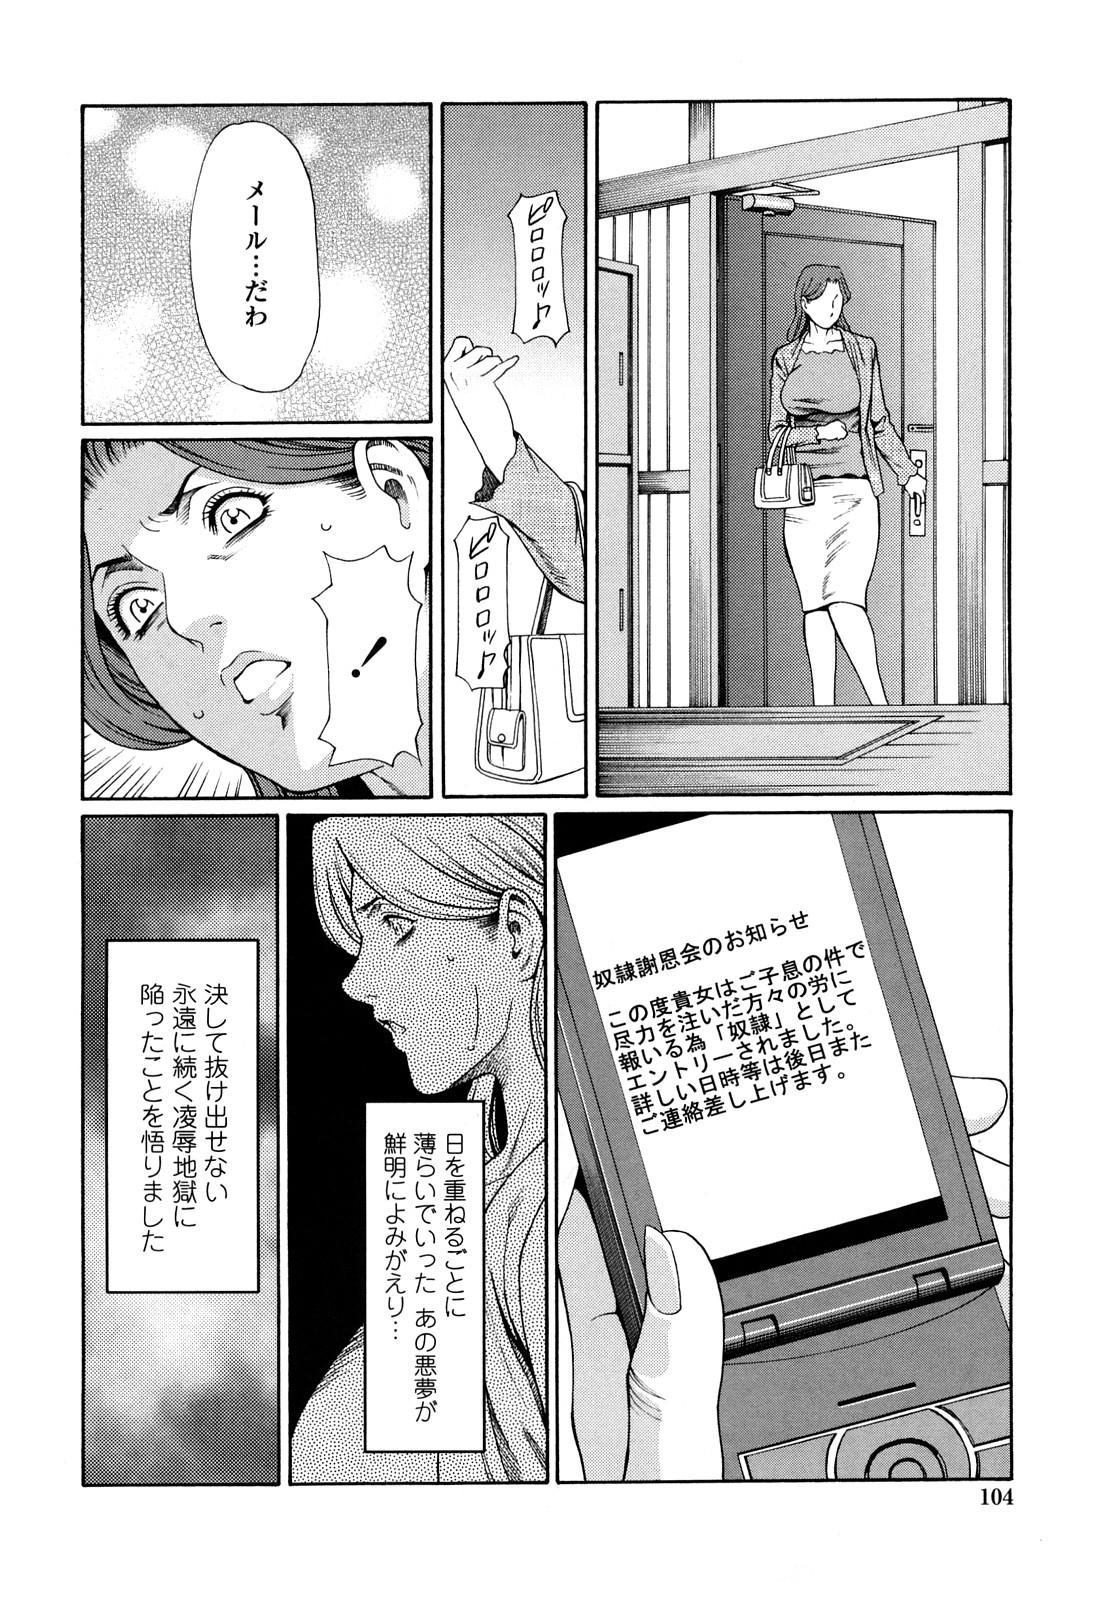 [Takasugi Kou] Kindan no Haha-Ana - Immorality Love-Hole [Decensored] 105